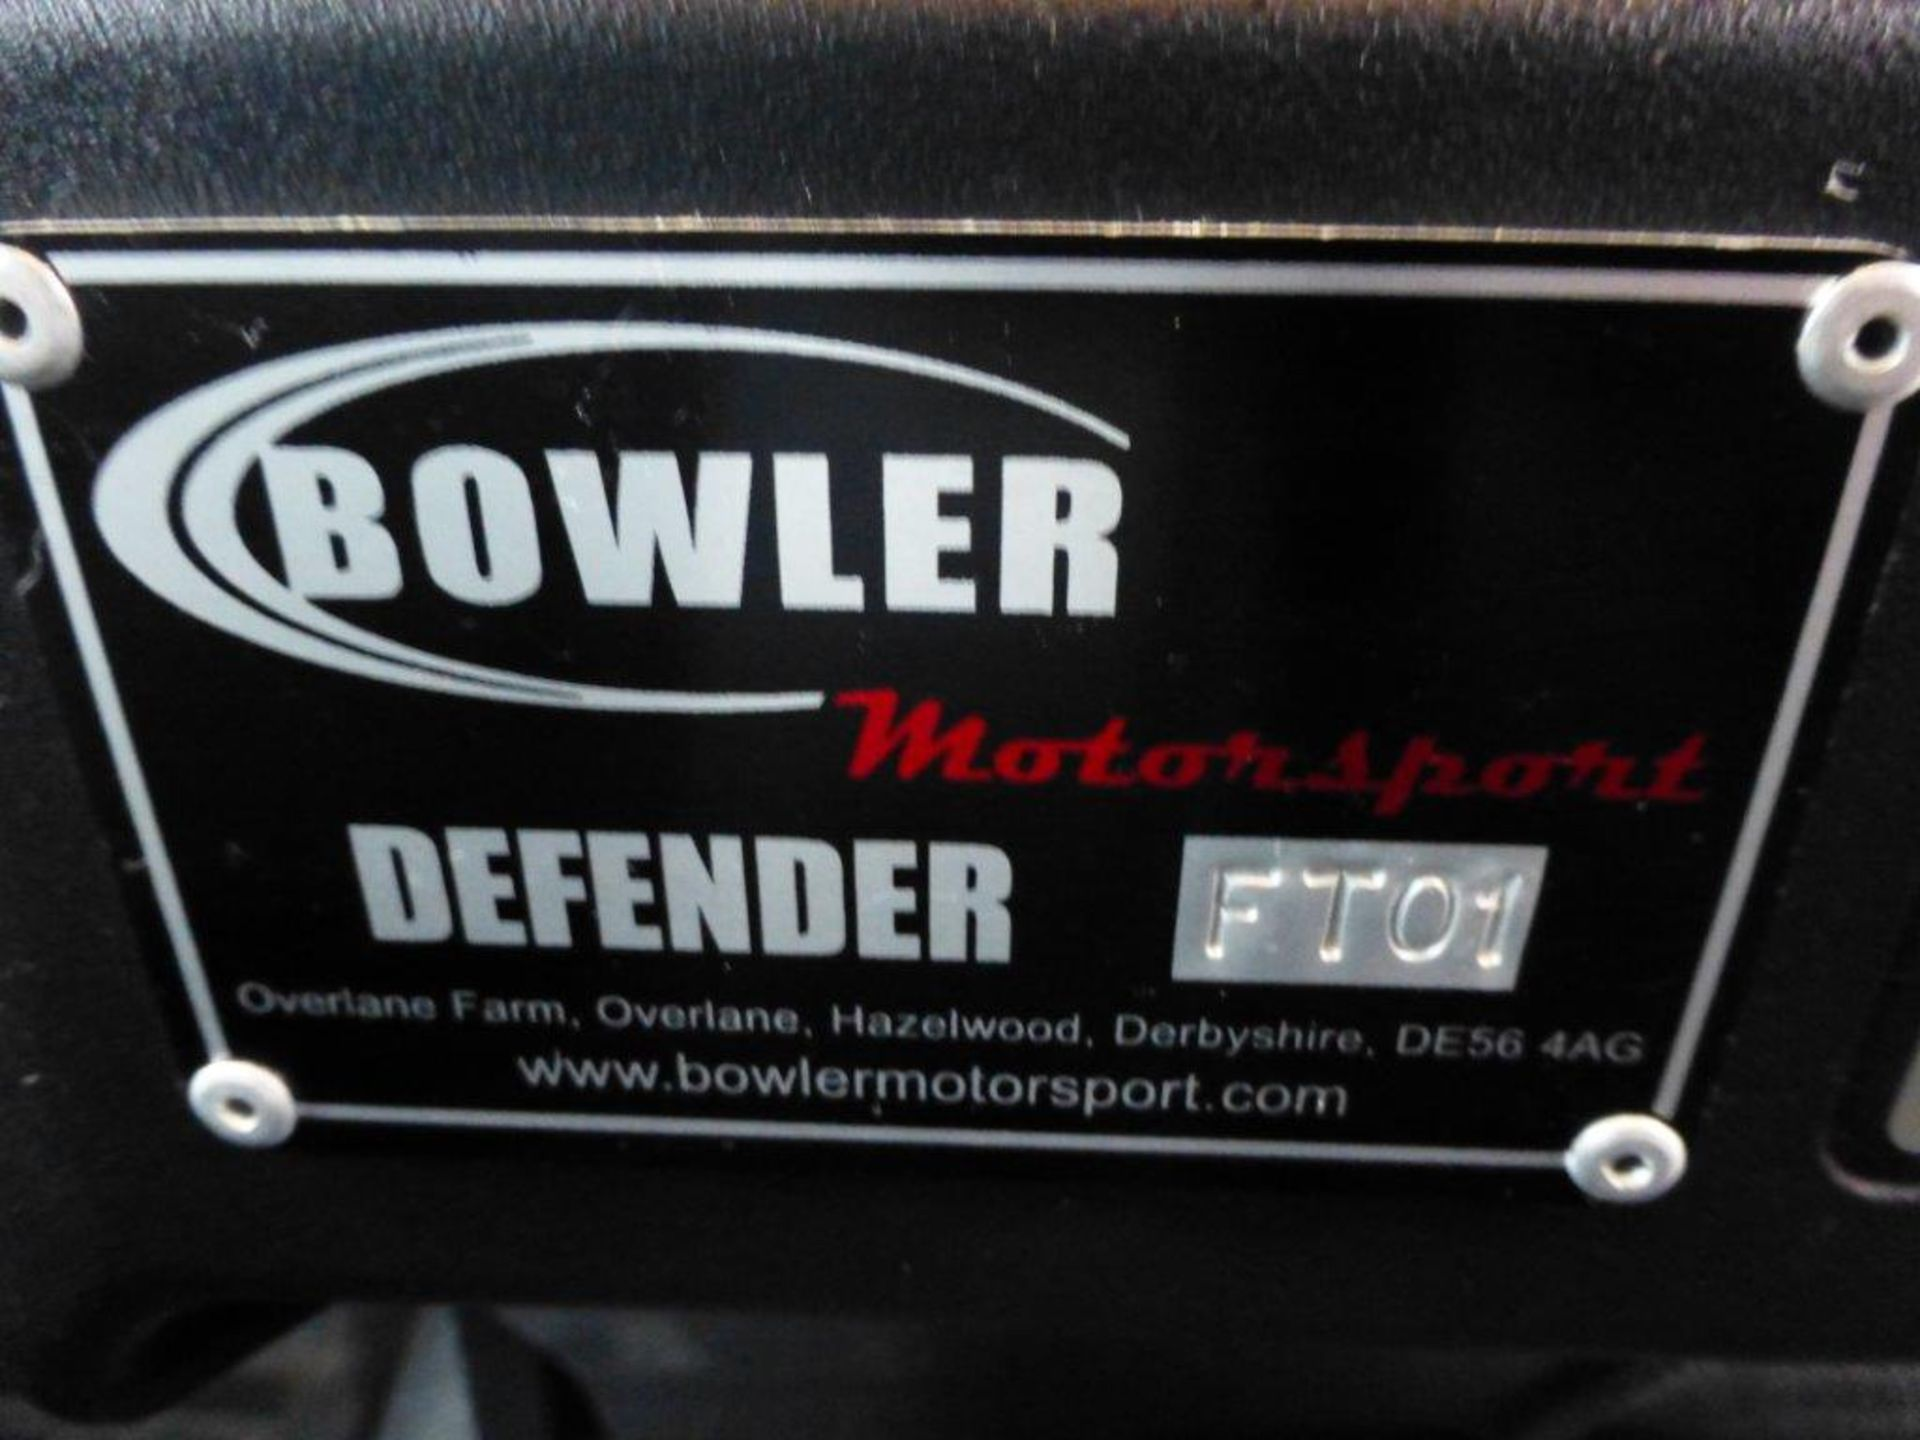 Land Rover Defender 110 XS Bowler double cab pickup TDCi (2.2). Reg no. T9 FNK. Reg. date 23/03/ - Image 12 of 13